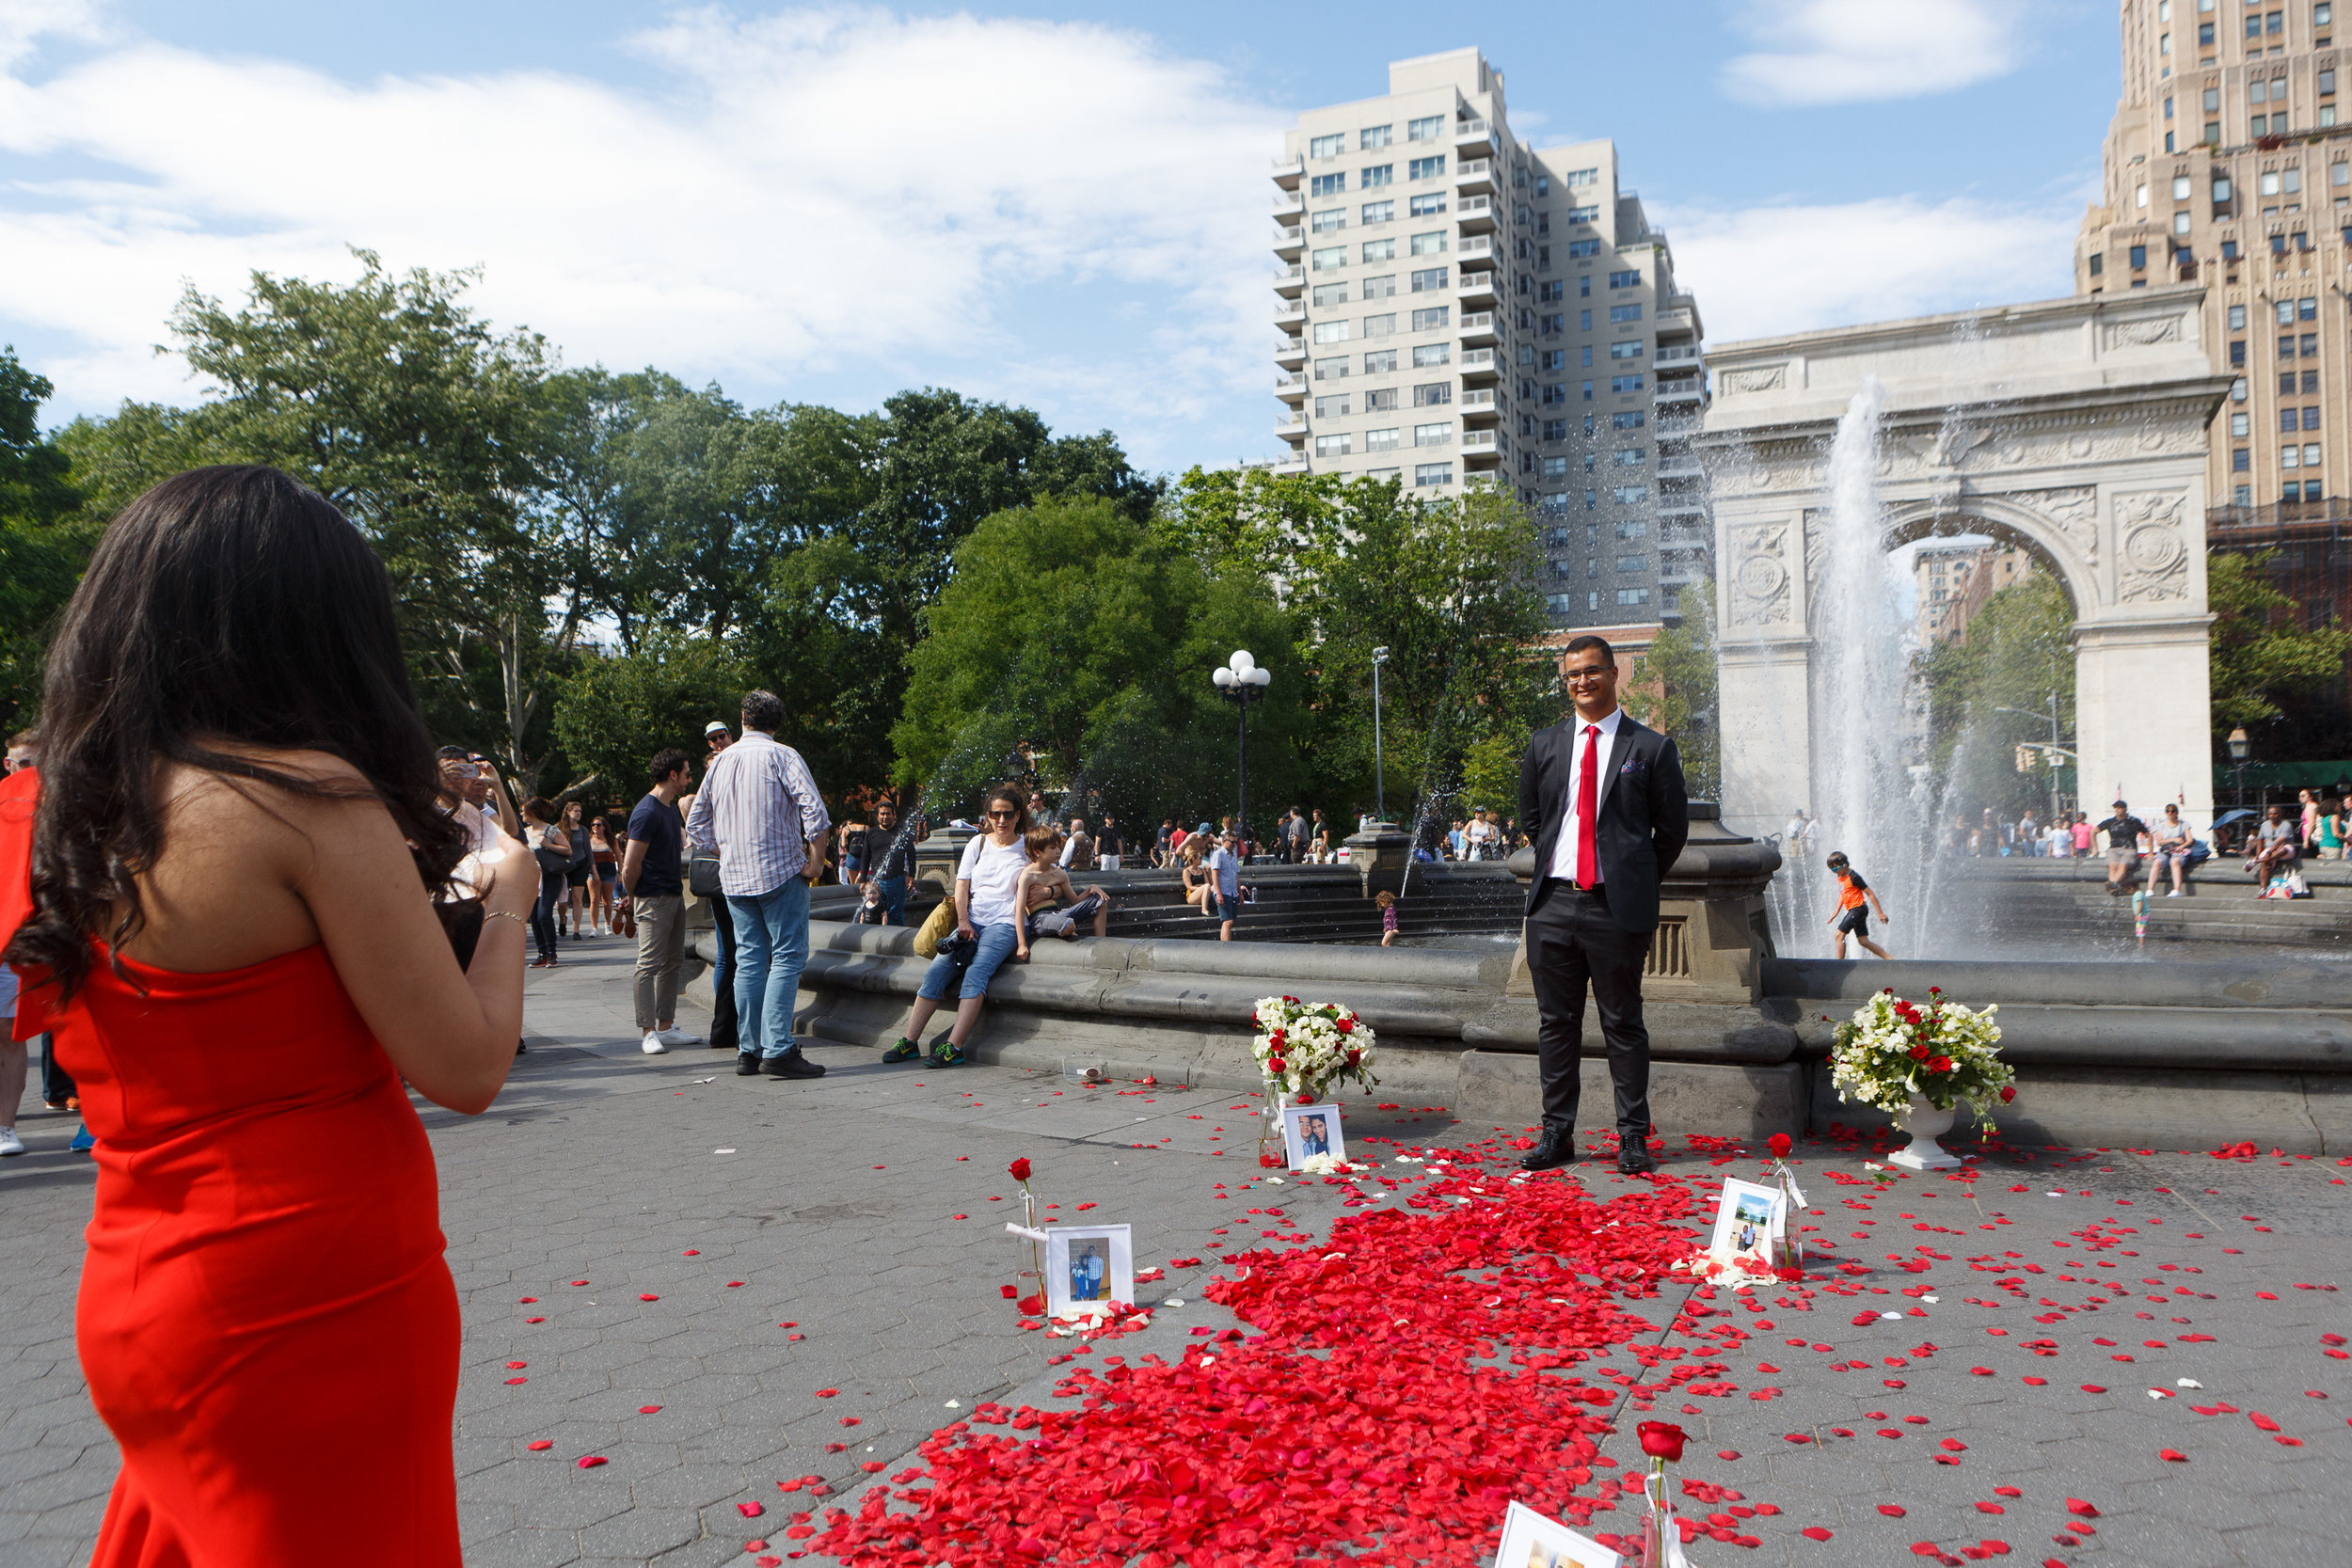 Kiro Rebecca Washington Square Park Marriage Proposal _ Jonathan Heisler _ 6152019 _014.jpg